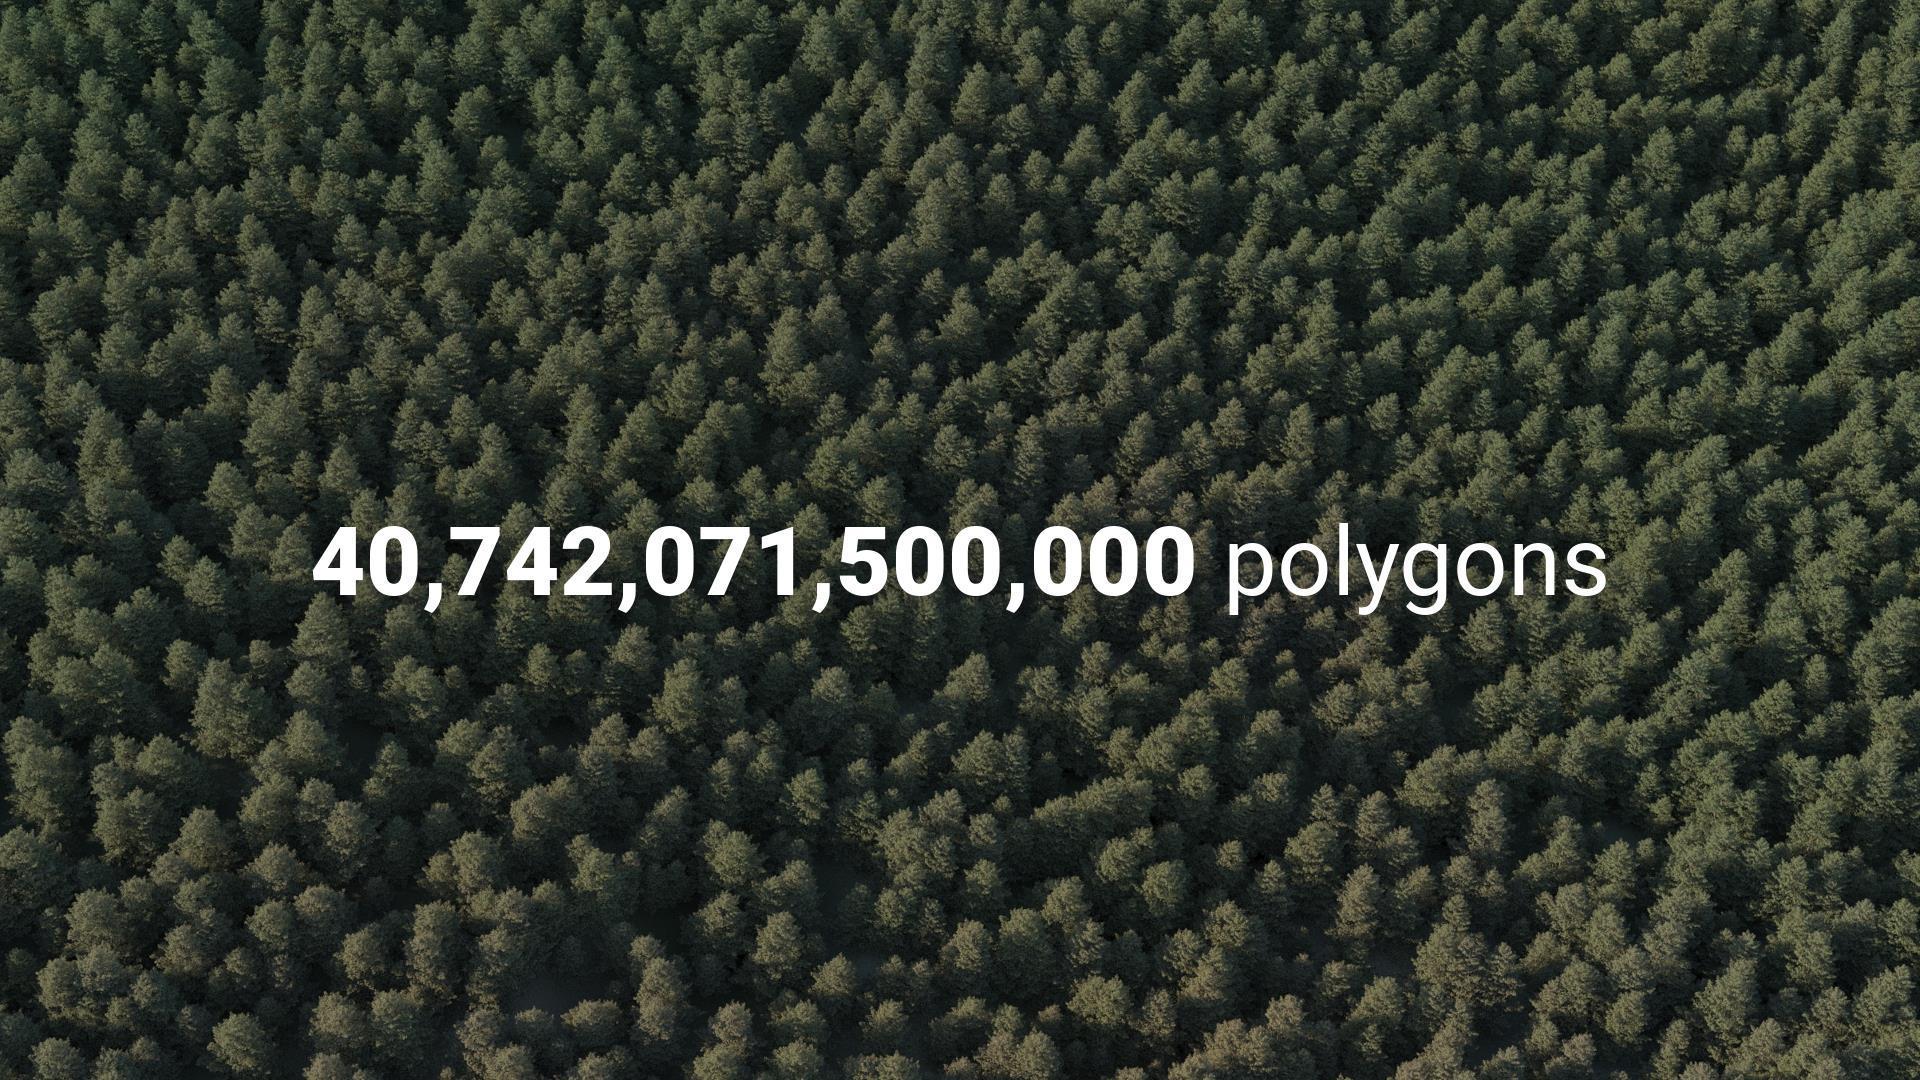 40 trillions polygons